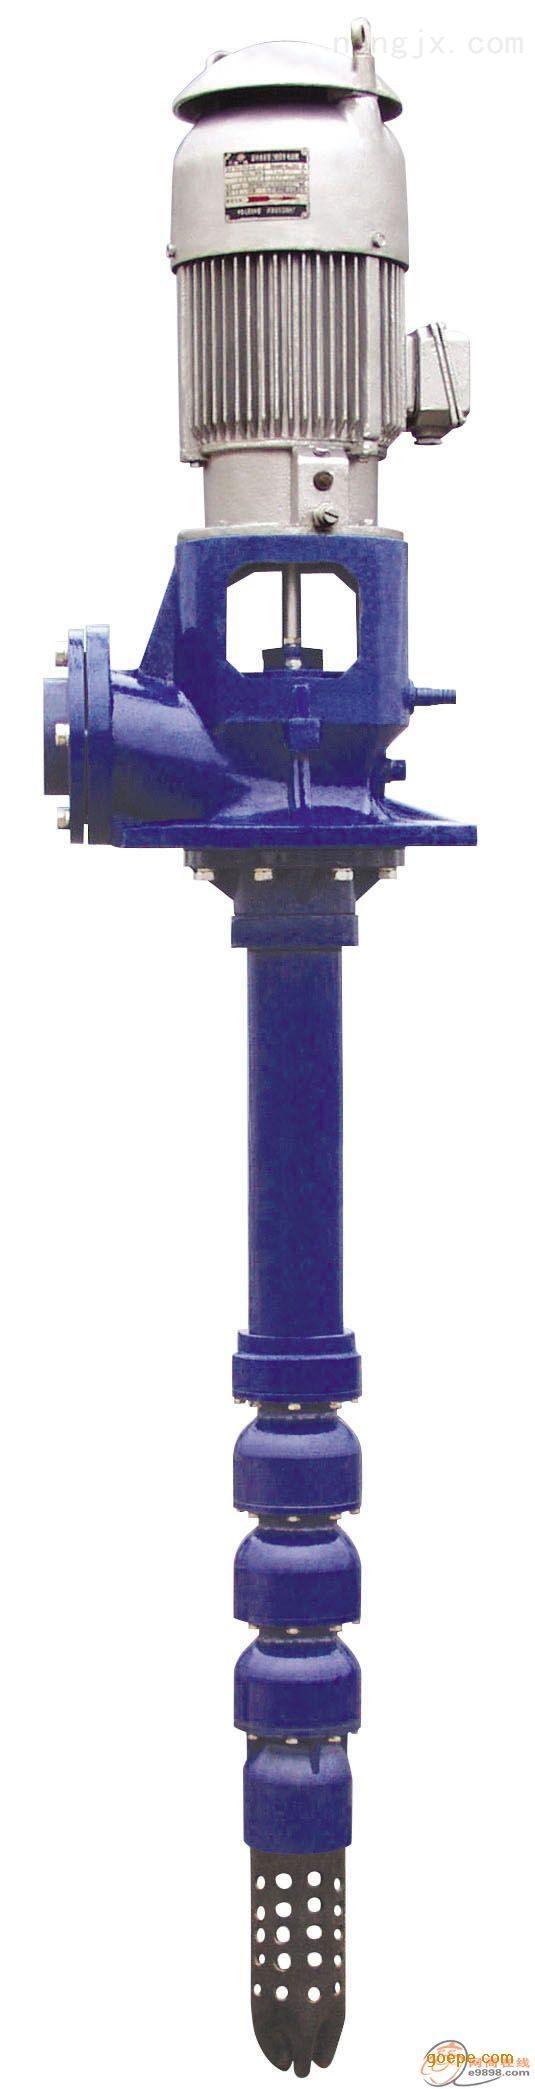 RCJ500矿用长轴深井泵